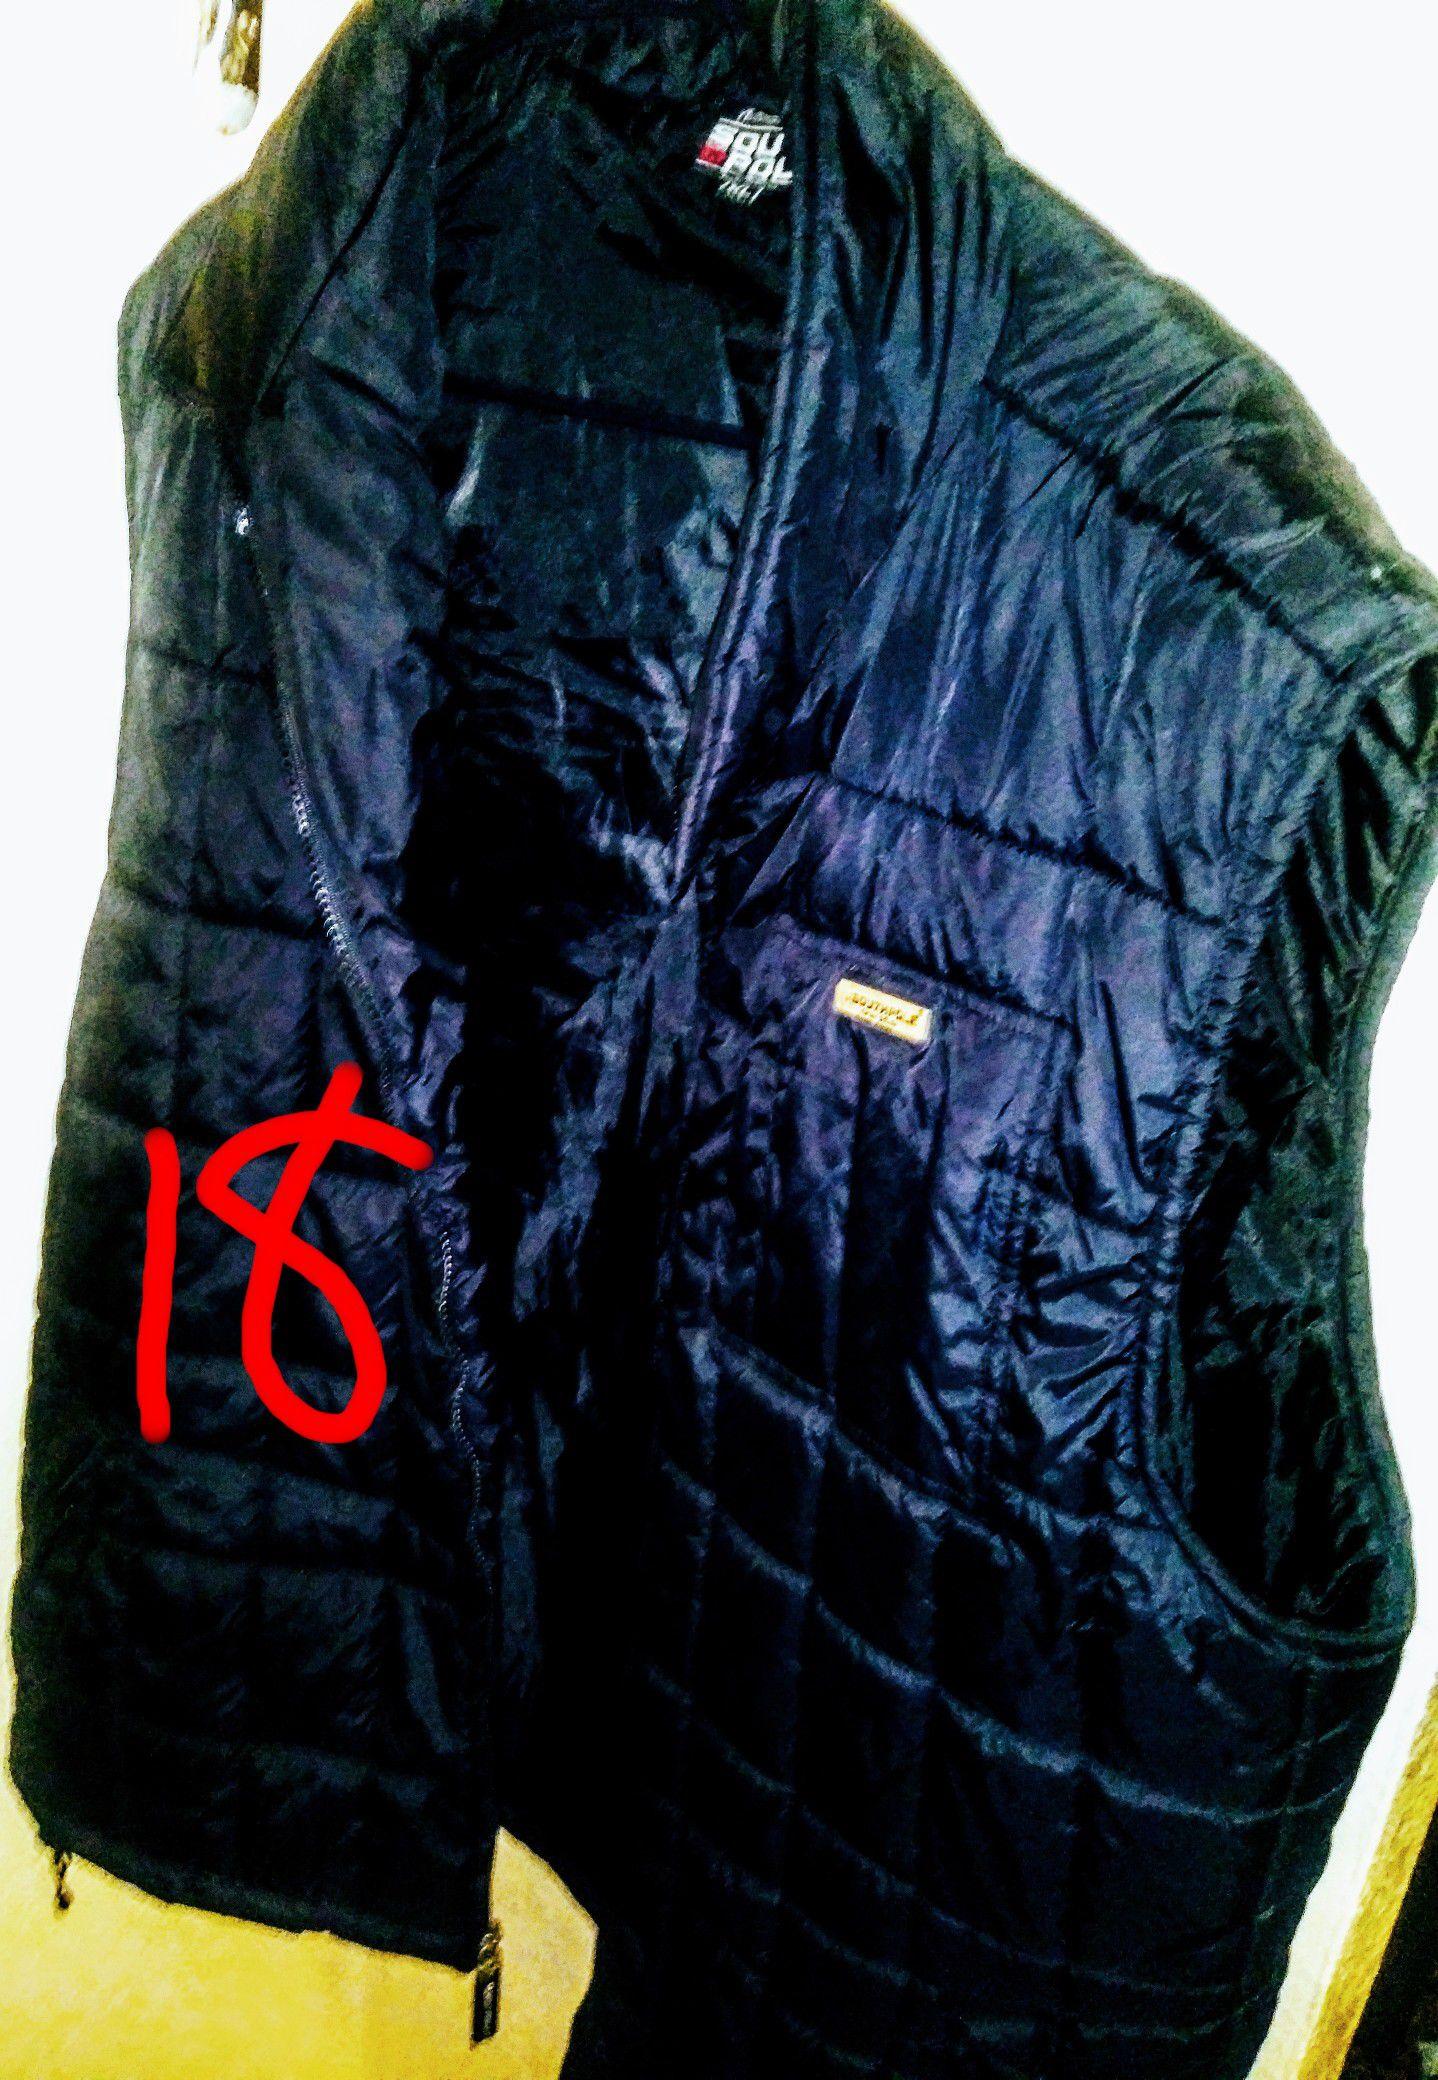 Extra large men's South Pole black vest